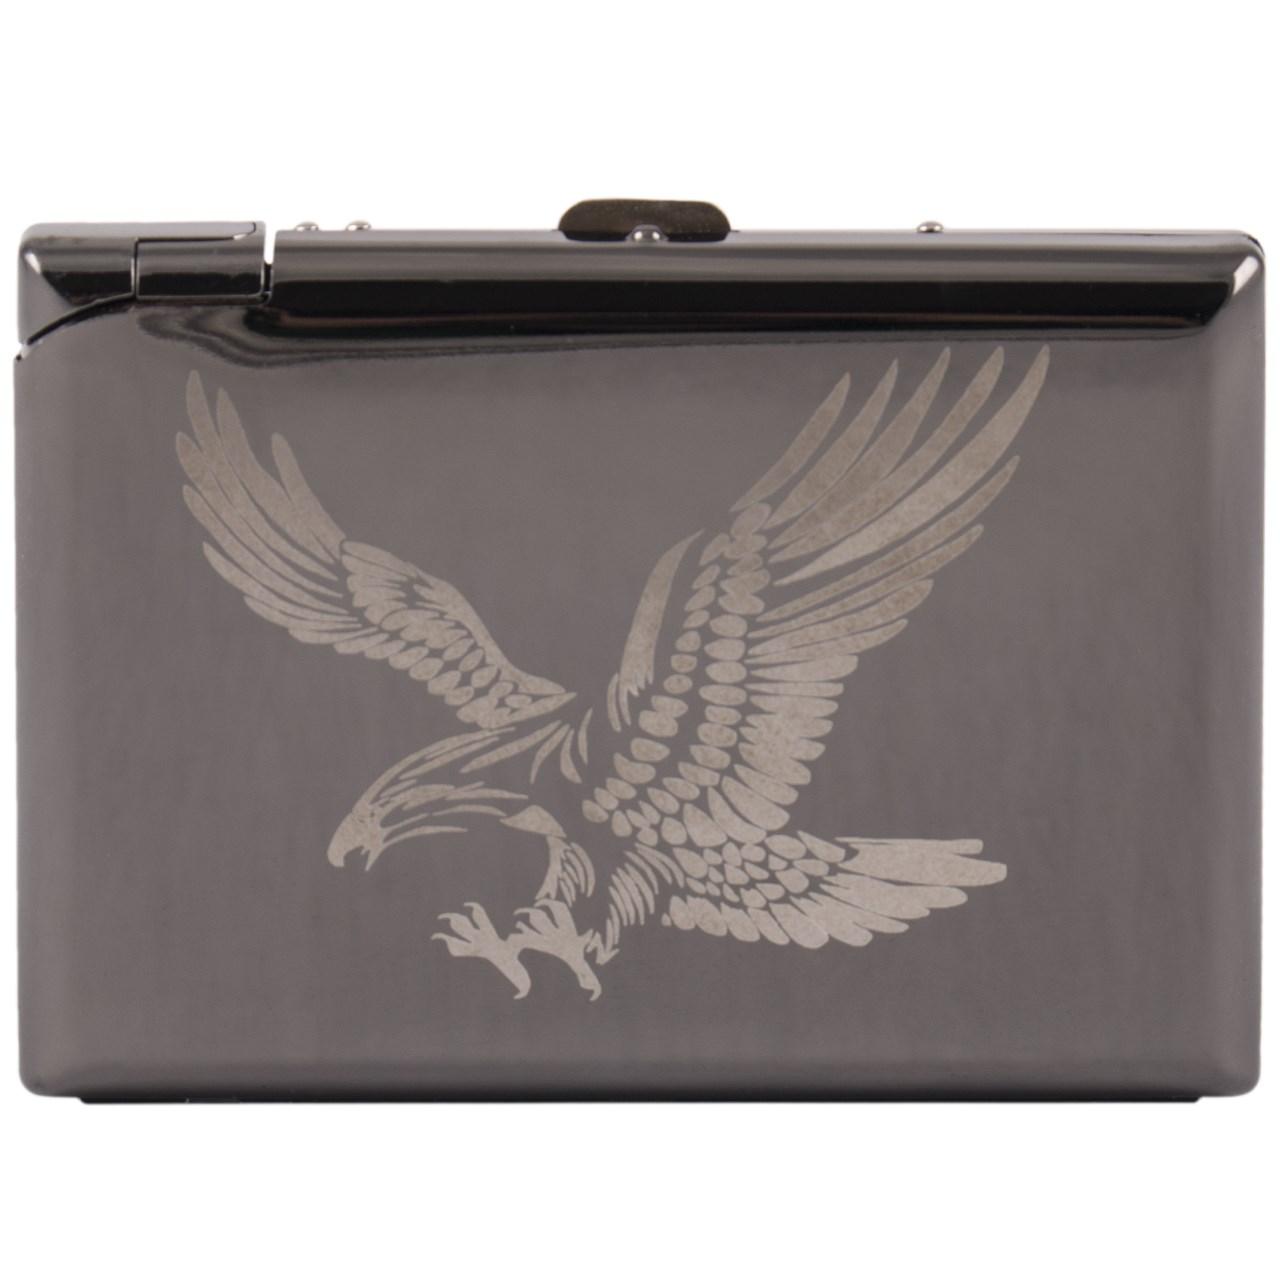 جاسیگاری دینقاو  مدل عقاب